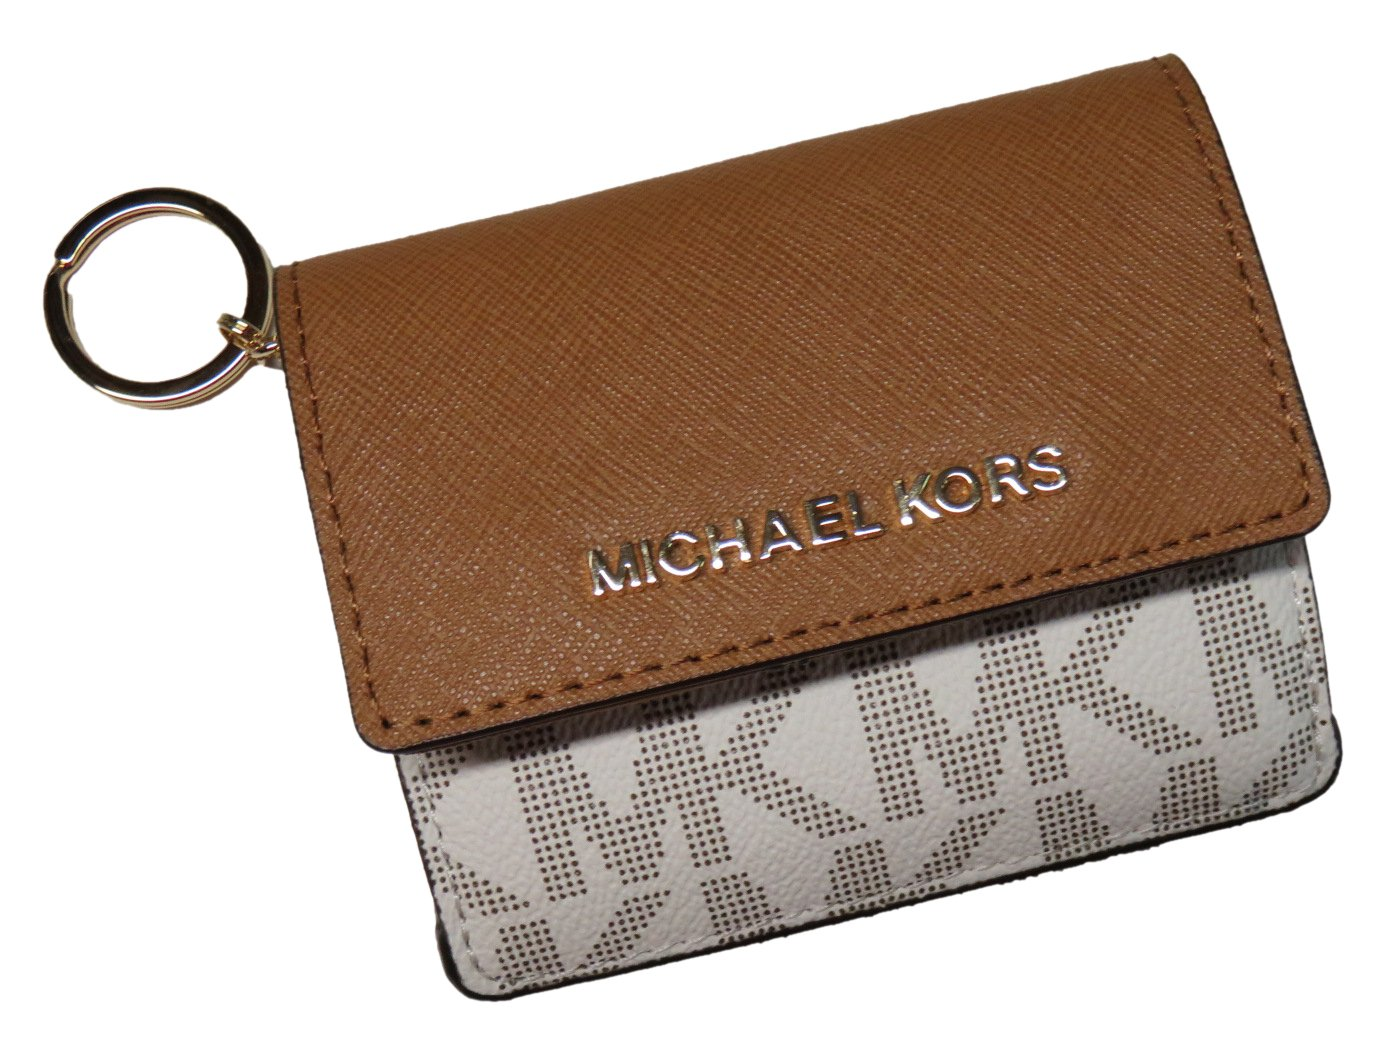 9576e75f3ad0 Galleon - Michael Kors Jet Set Travel Card Case Wallet Vanilla/Acorn